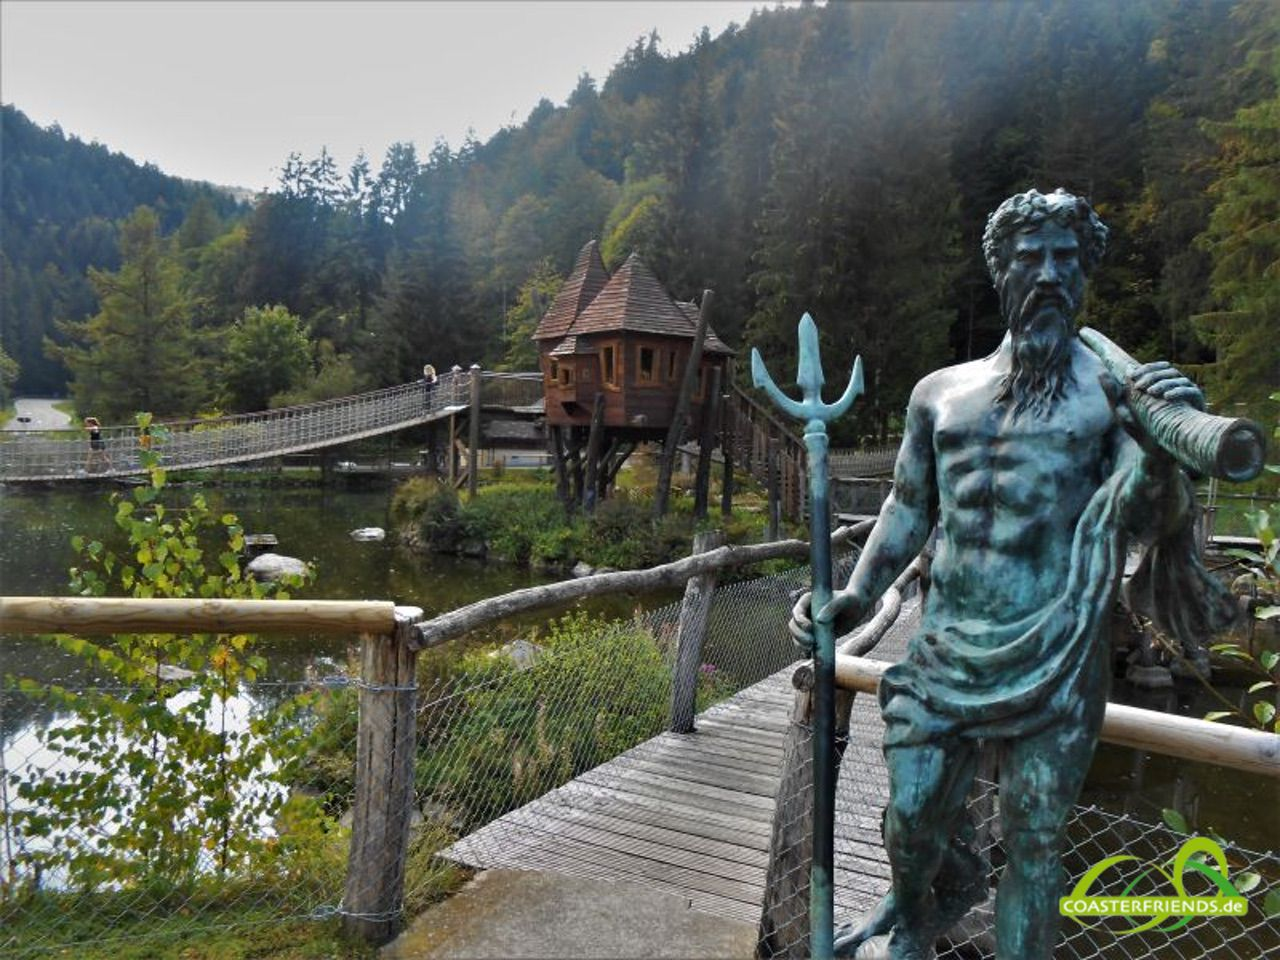 Europa - https://coasterfriends.de/joomla//images/pcp_parkdetails/europa/o2708_steinwasen_park/content3.jpg